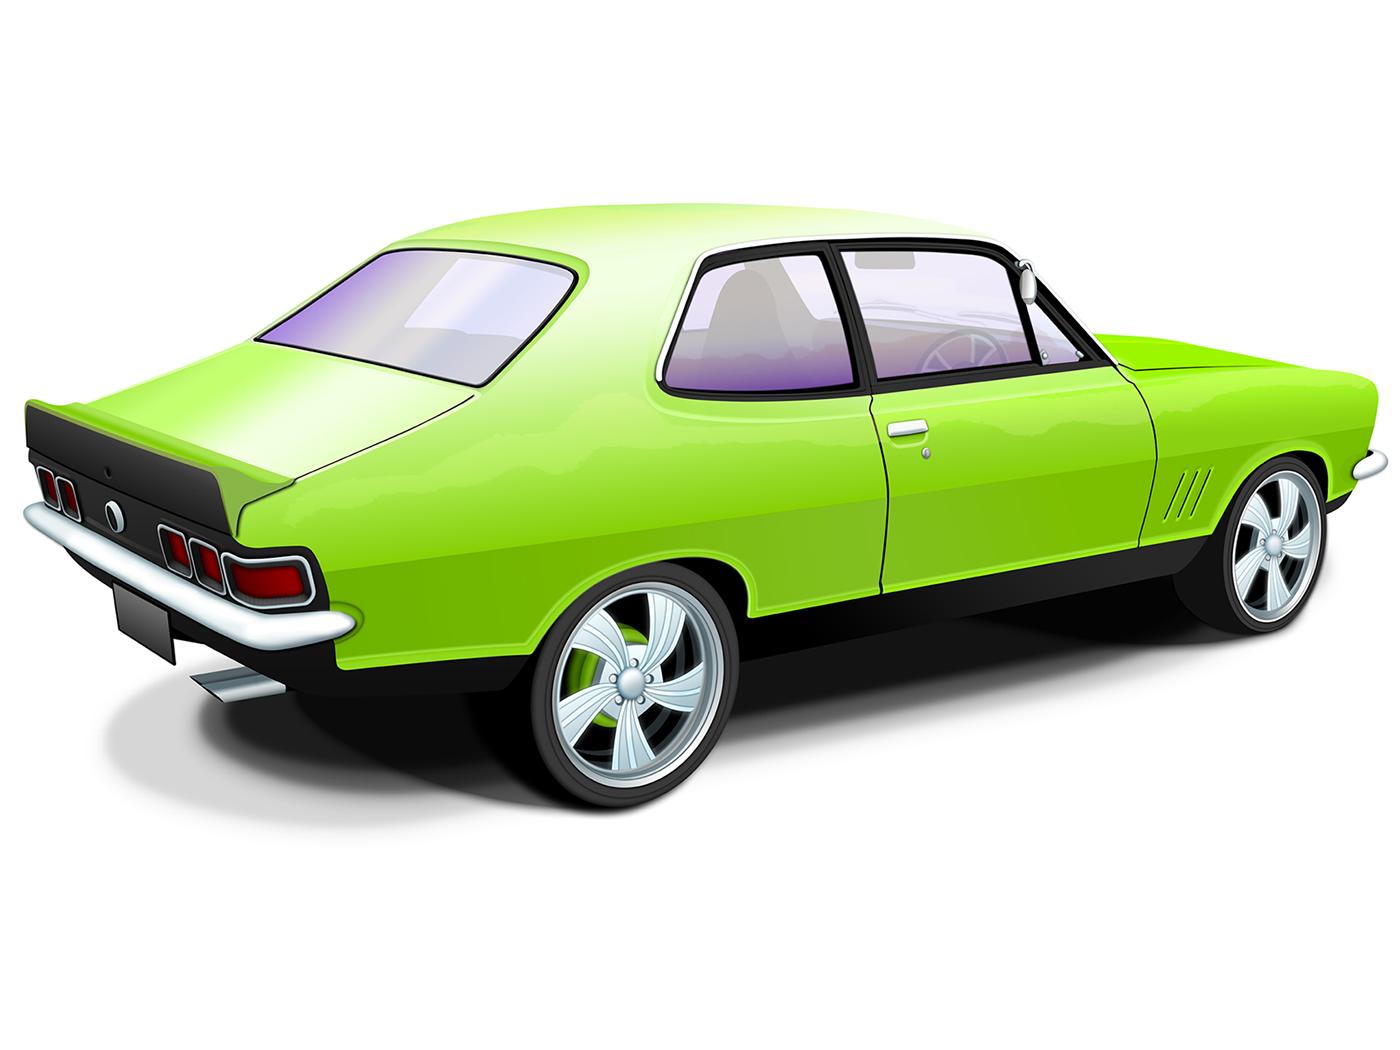 Australian Muscle Car Classic Wallpaper Download 1400x1050